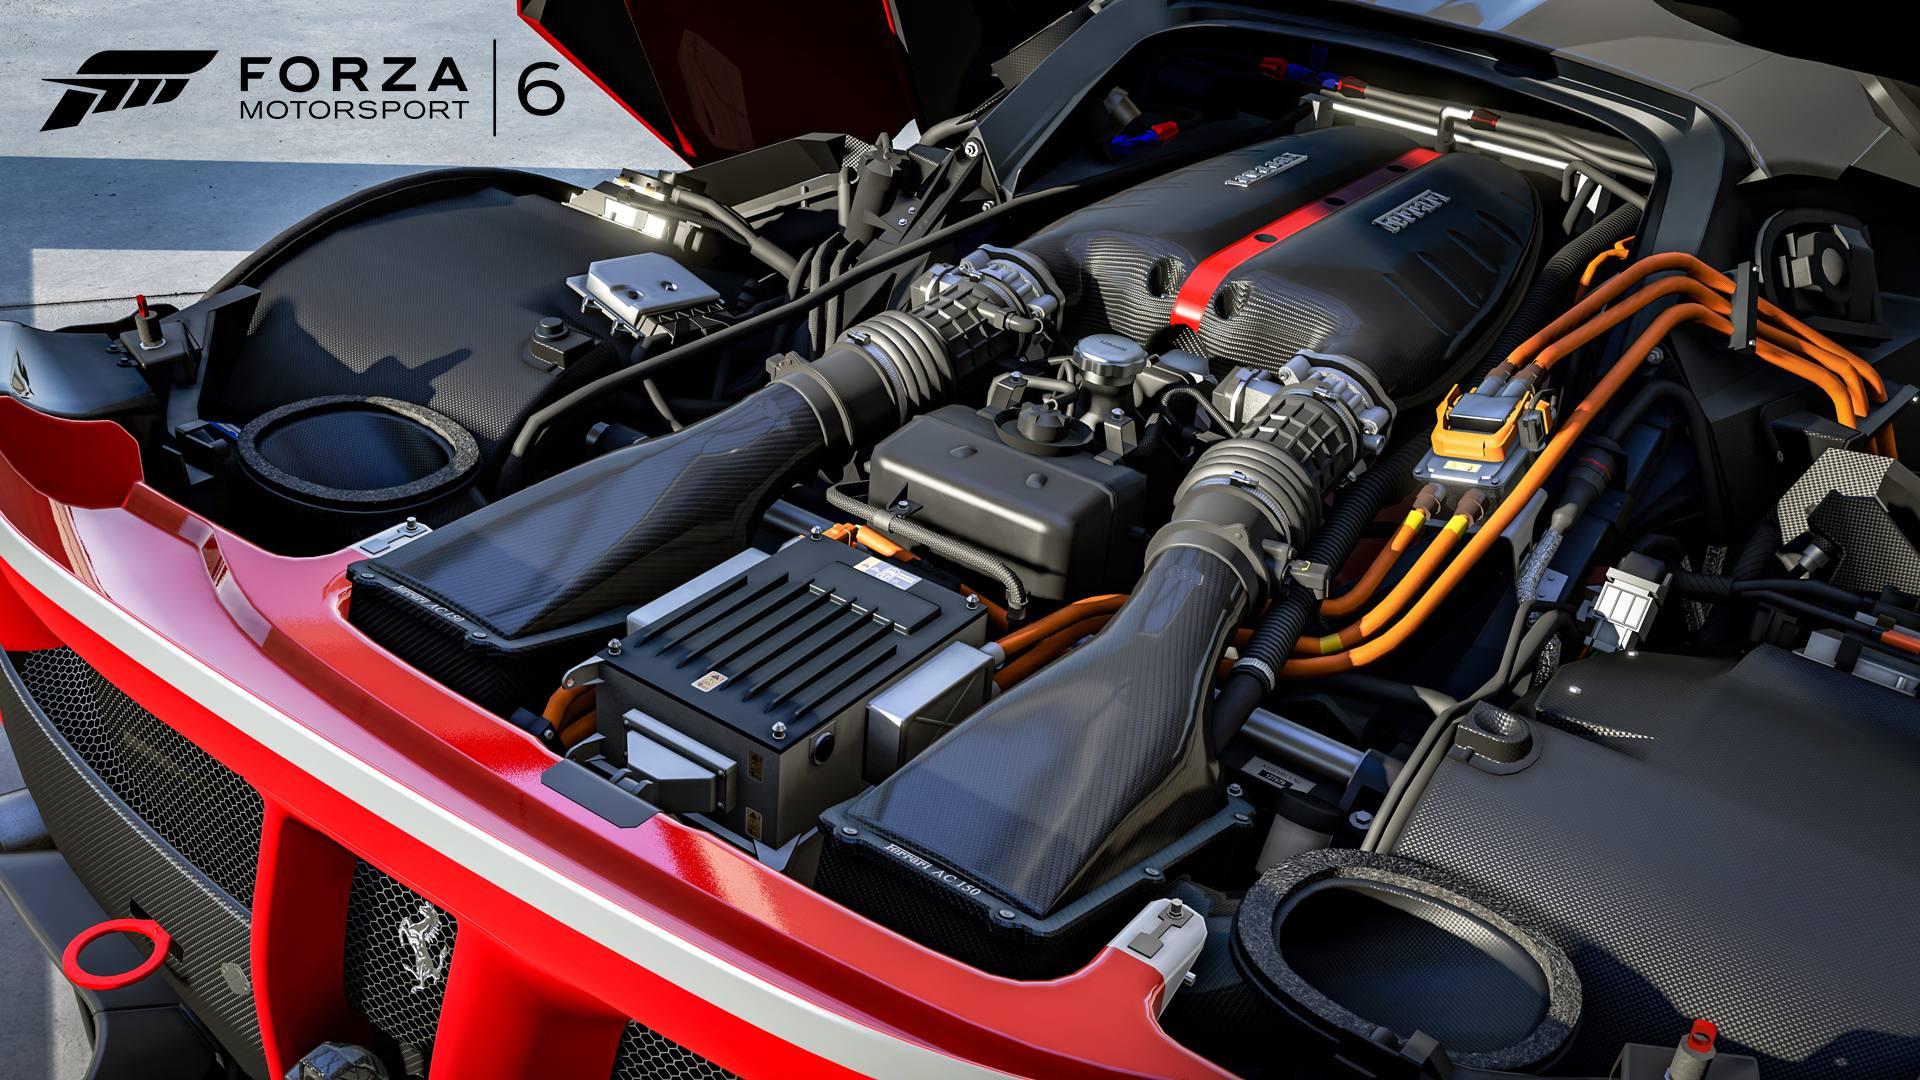 Forza Motorsport 6 2014 Ferrari FXX K 05-04-16 002